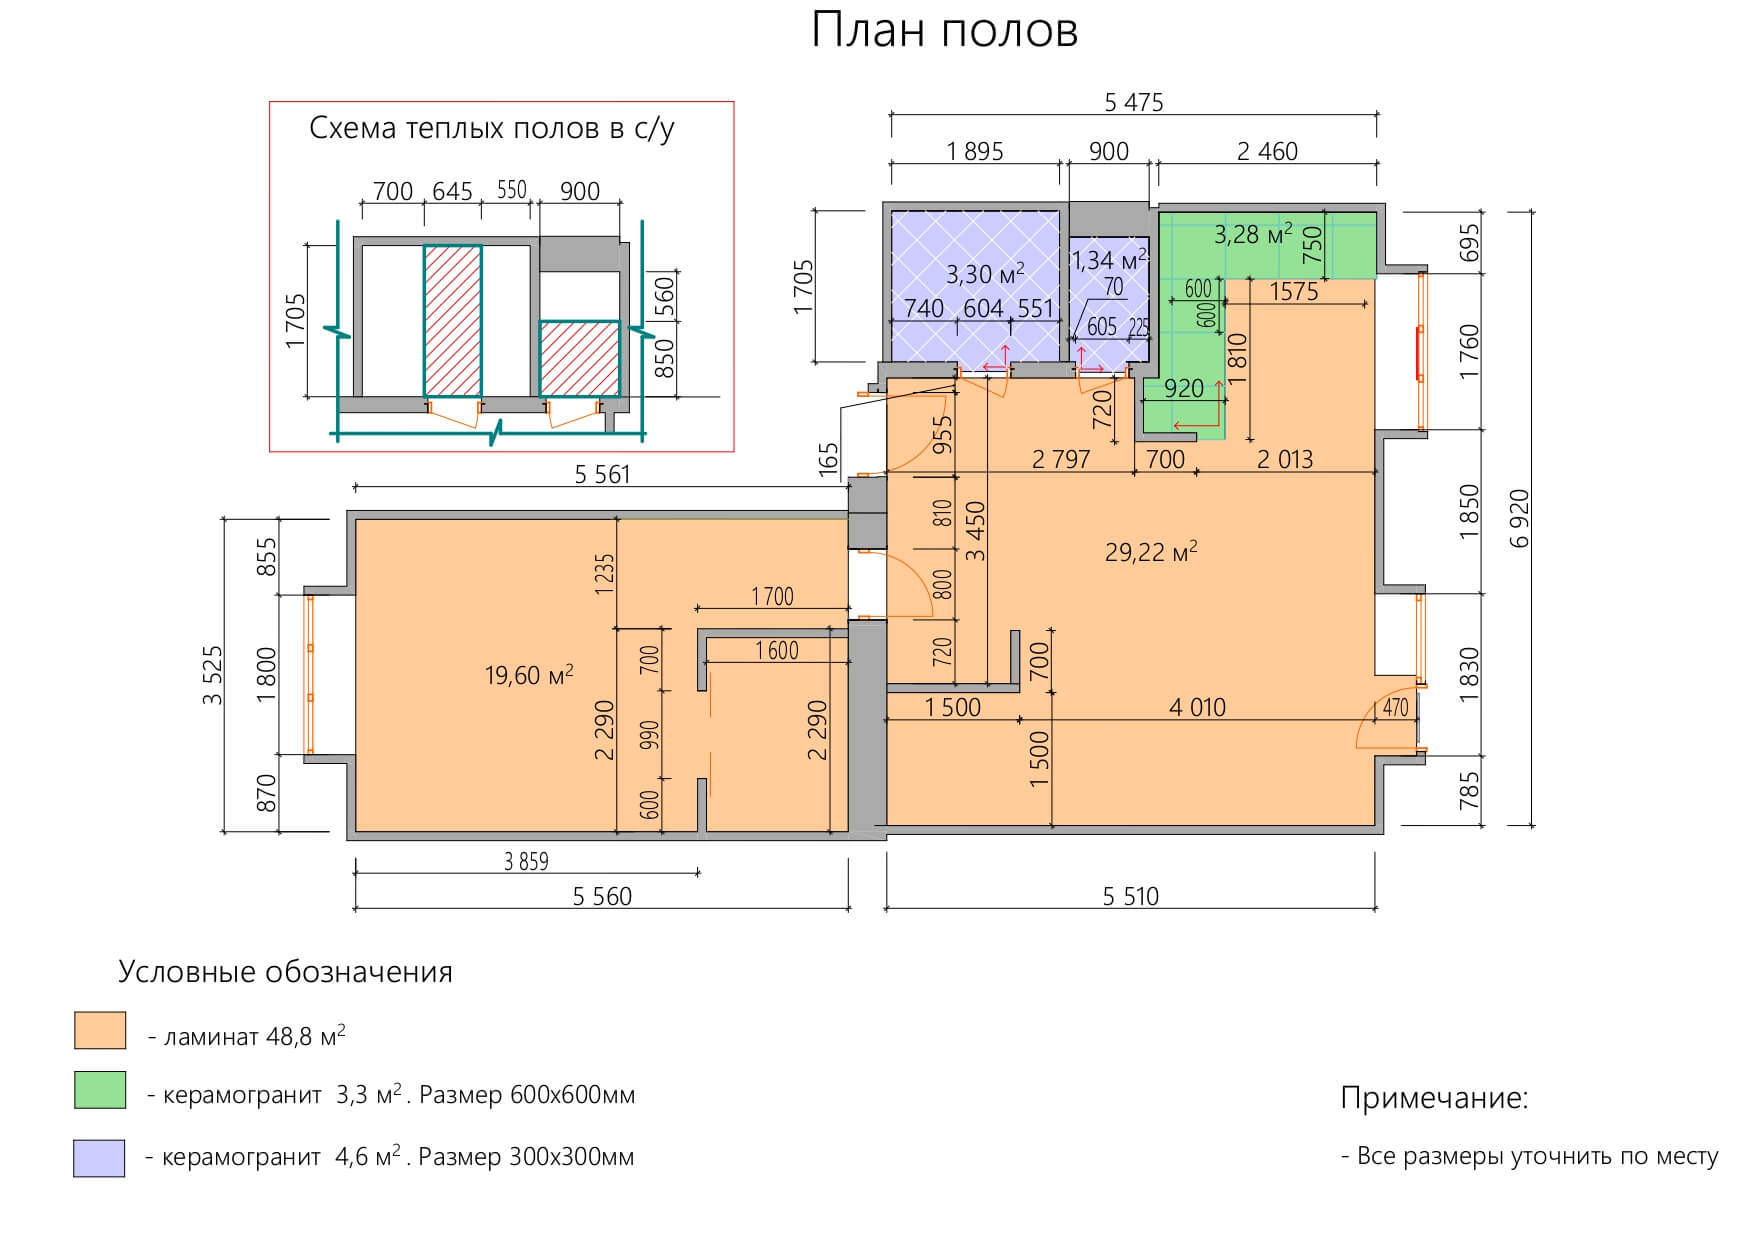 2-А4 План полов_page-0001